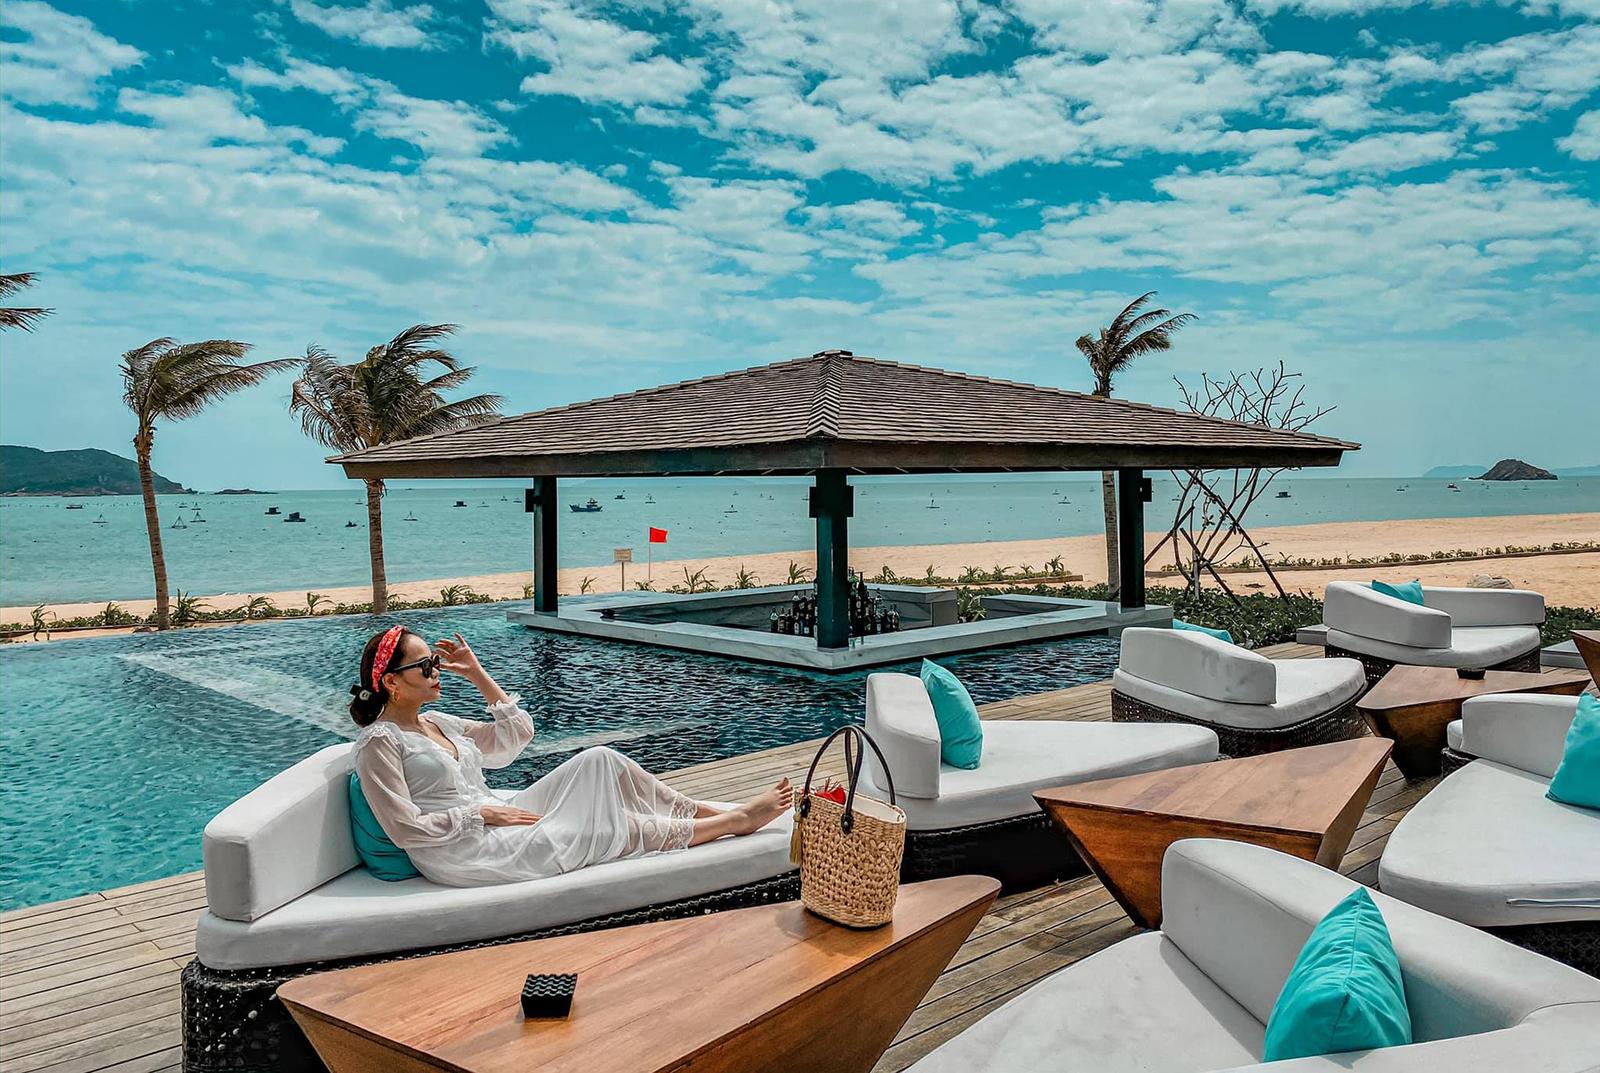 resort-quynhon-7716-1593164111.jpg